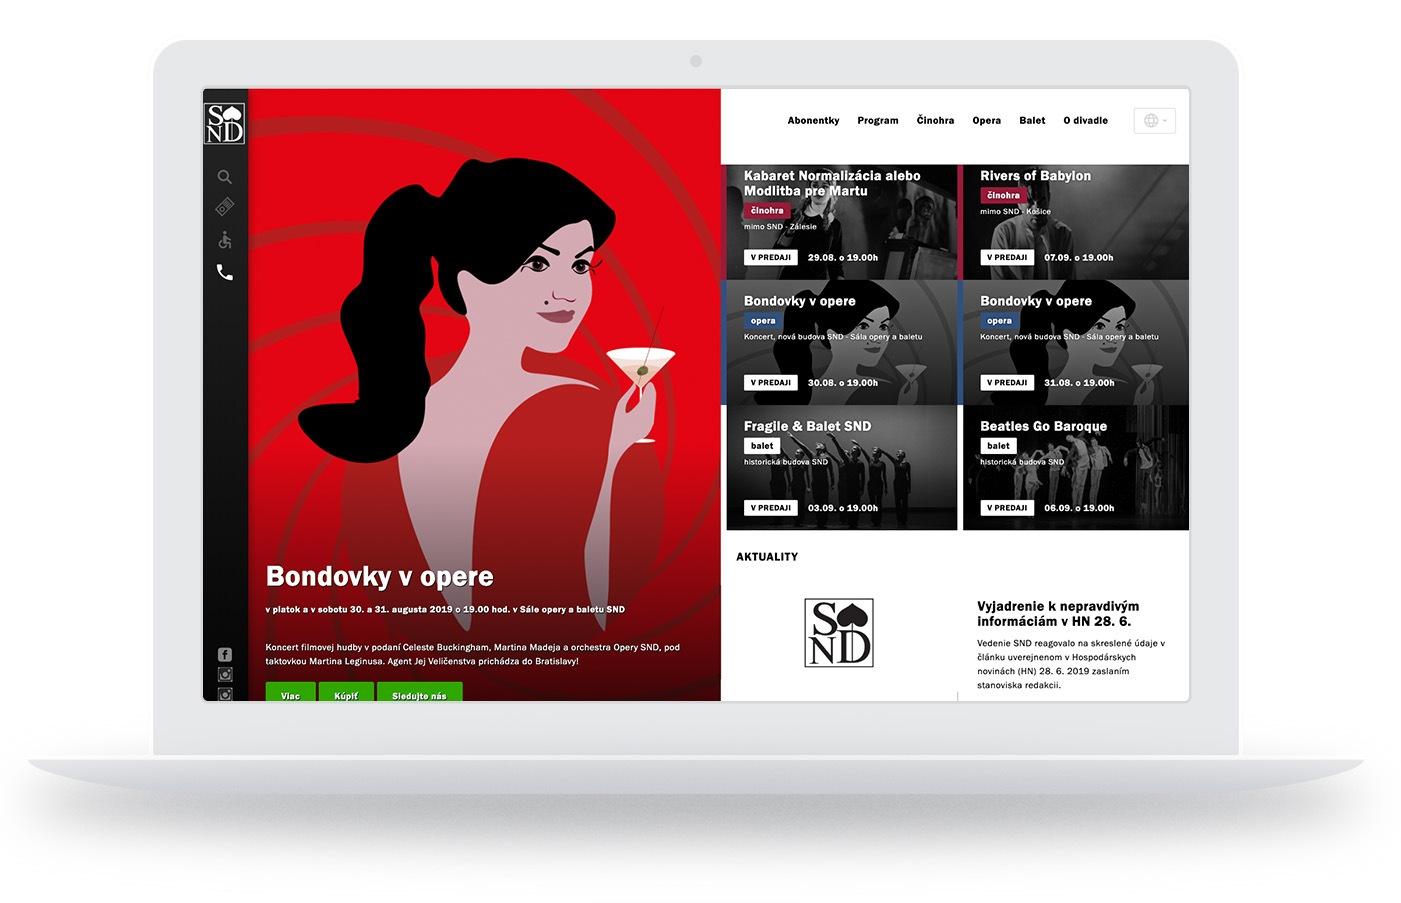 SND screen